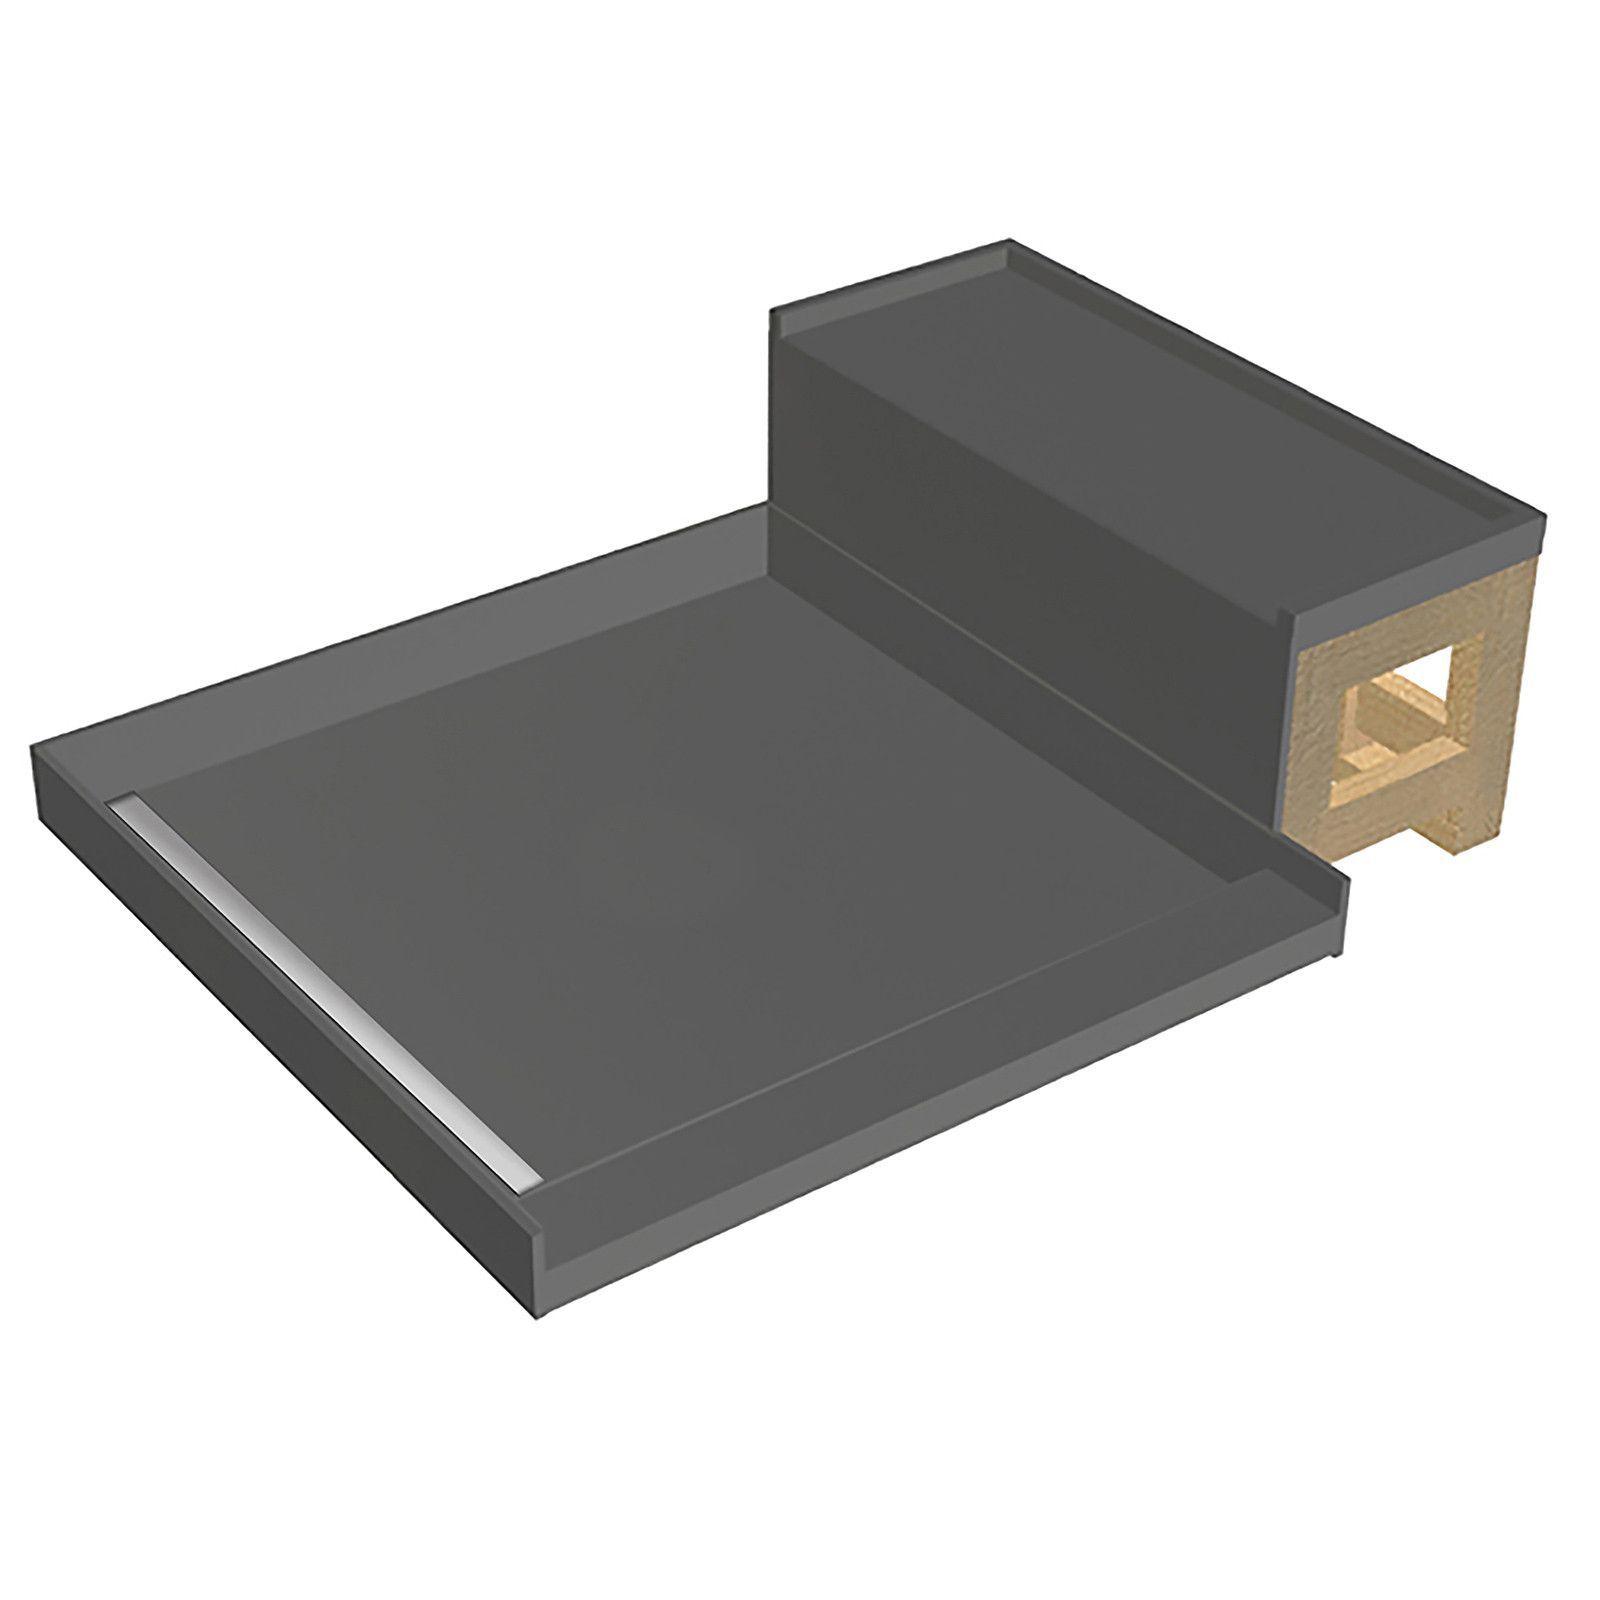 Tile Redi Wf3248l Rb32 Kit 32 X 48 Fully Integrated Left Pvc